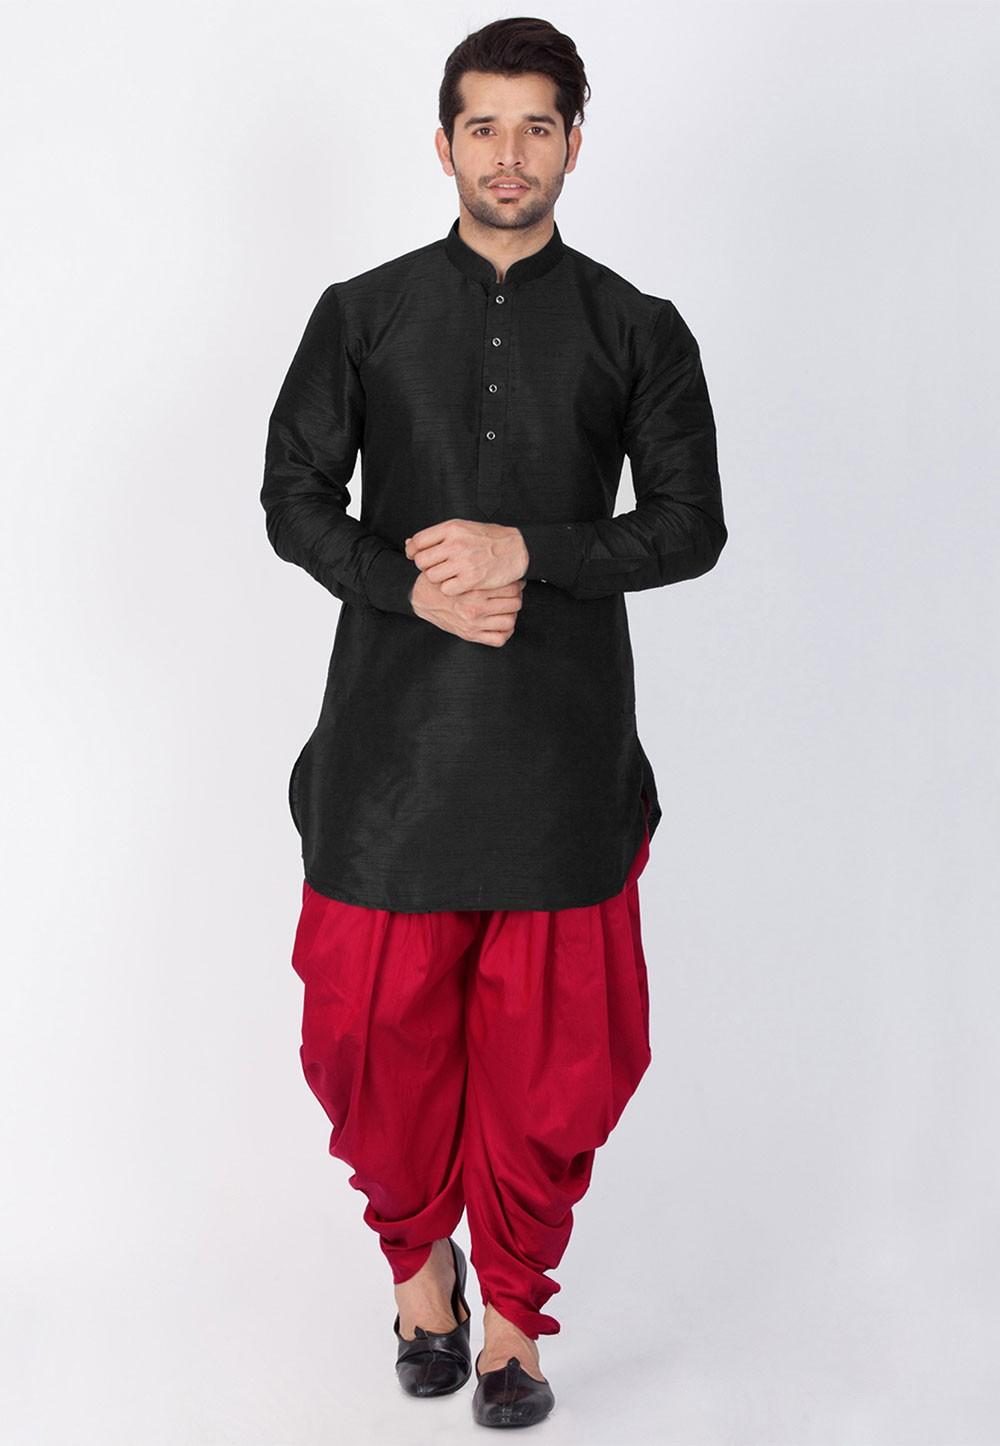 Party Wear: Buy Dhoti Kurta Online for Men in Black Color